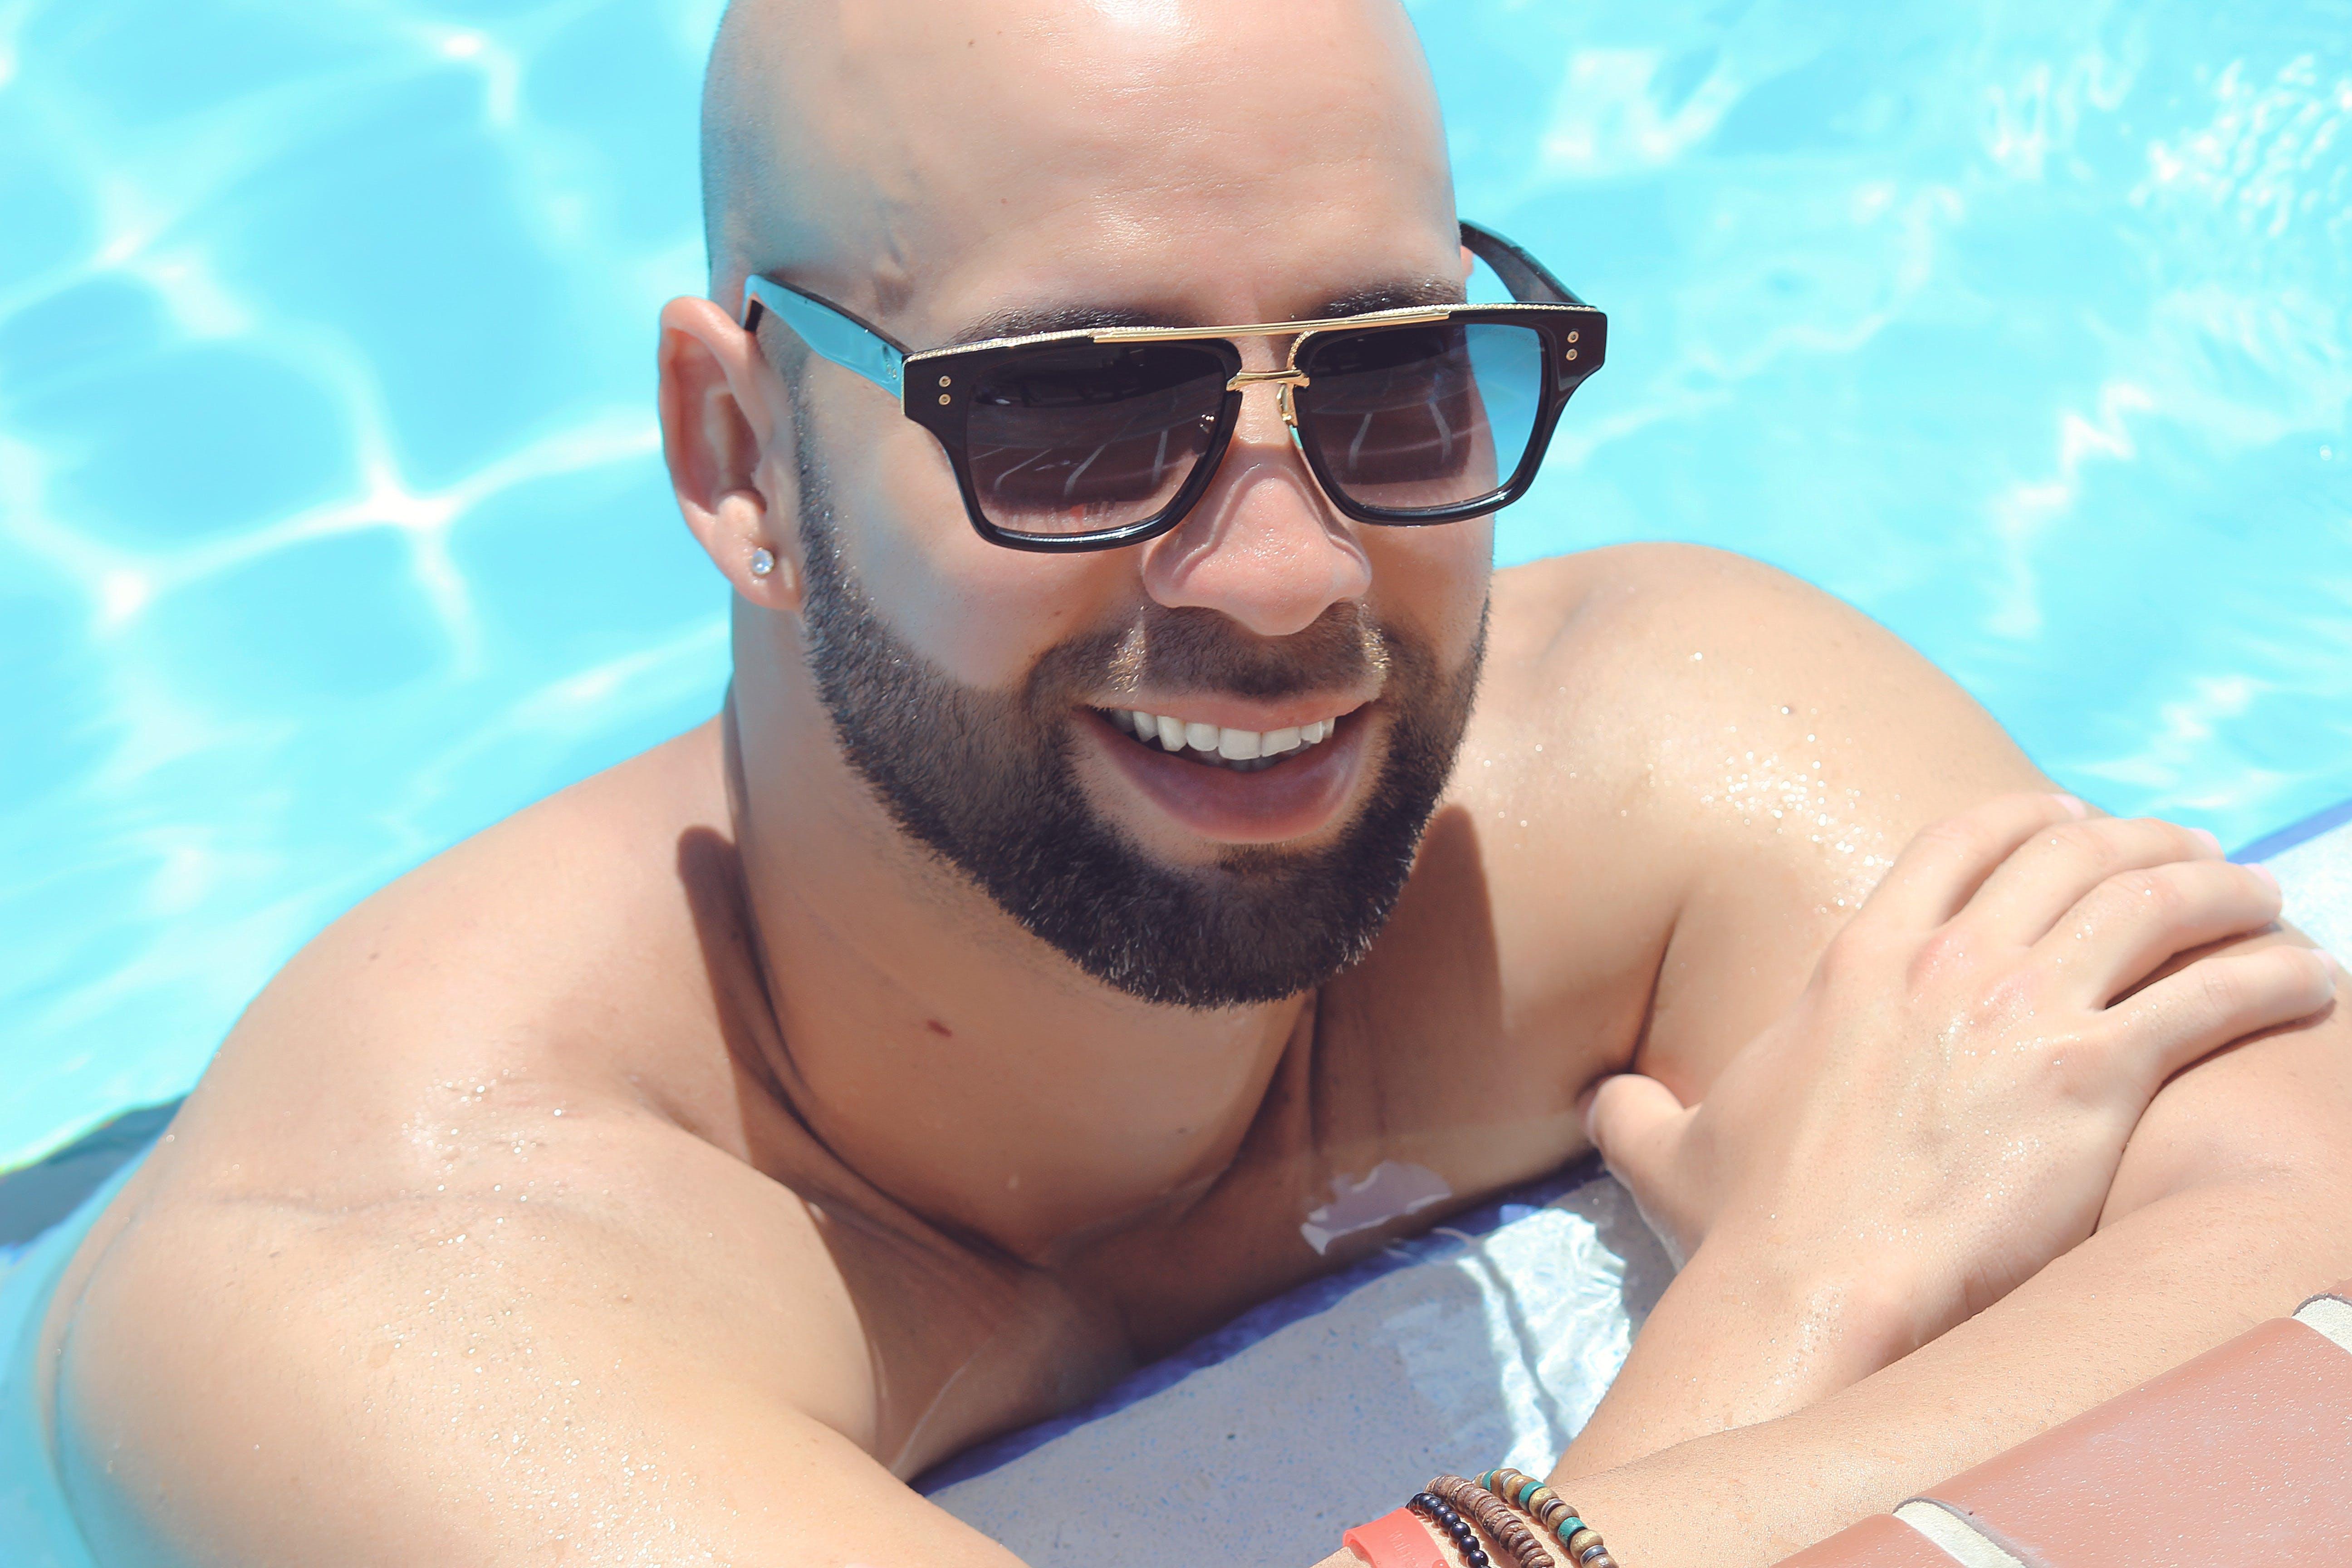 Man Wearing Black Framed Sunglasses